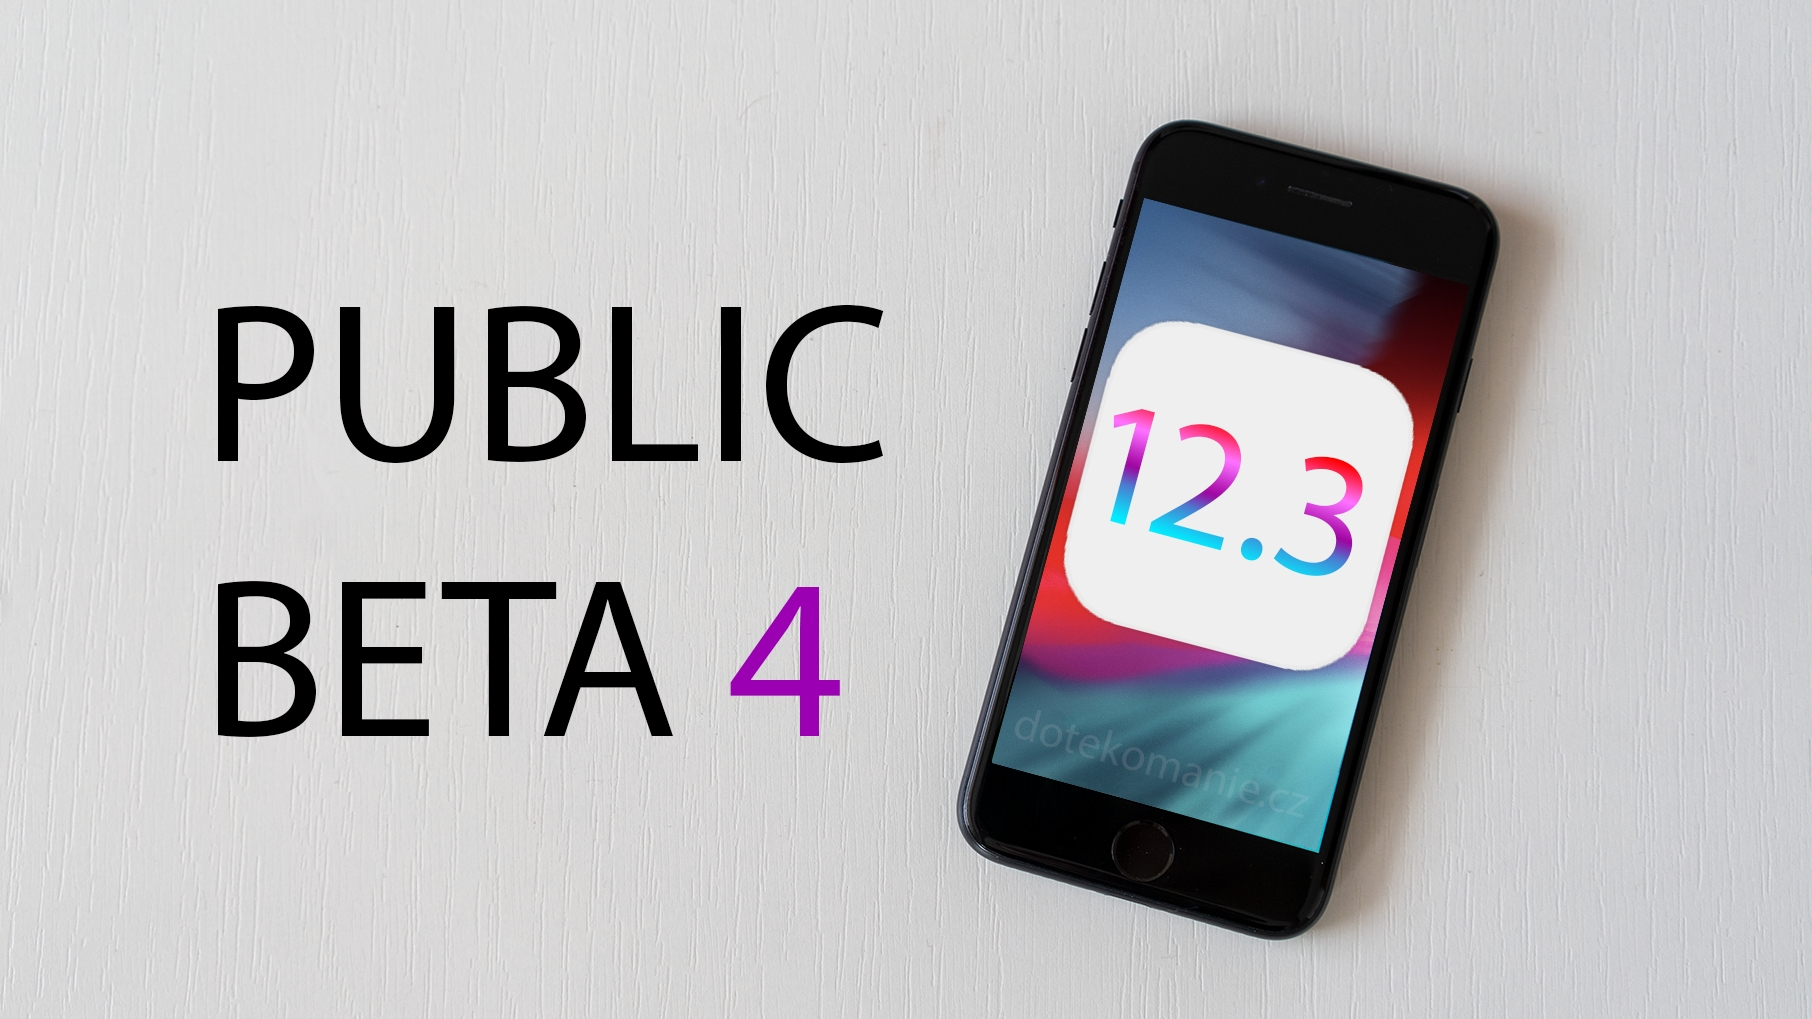 Apple do světa vypustil iOS 12.3 beta 4